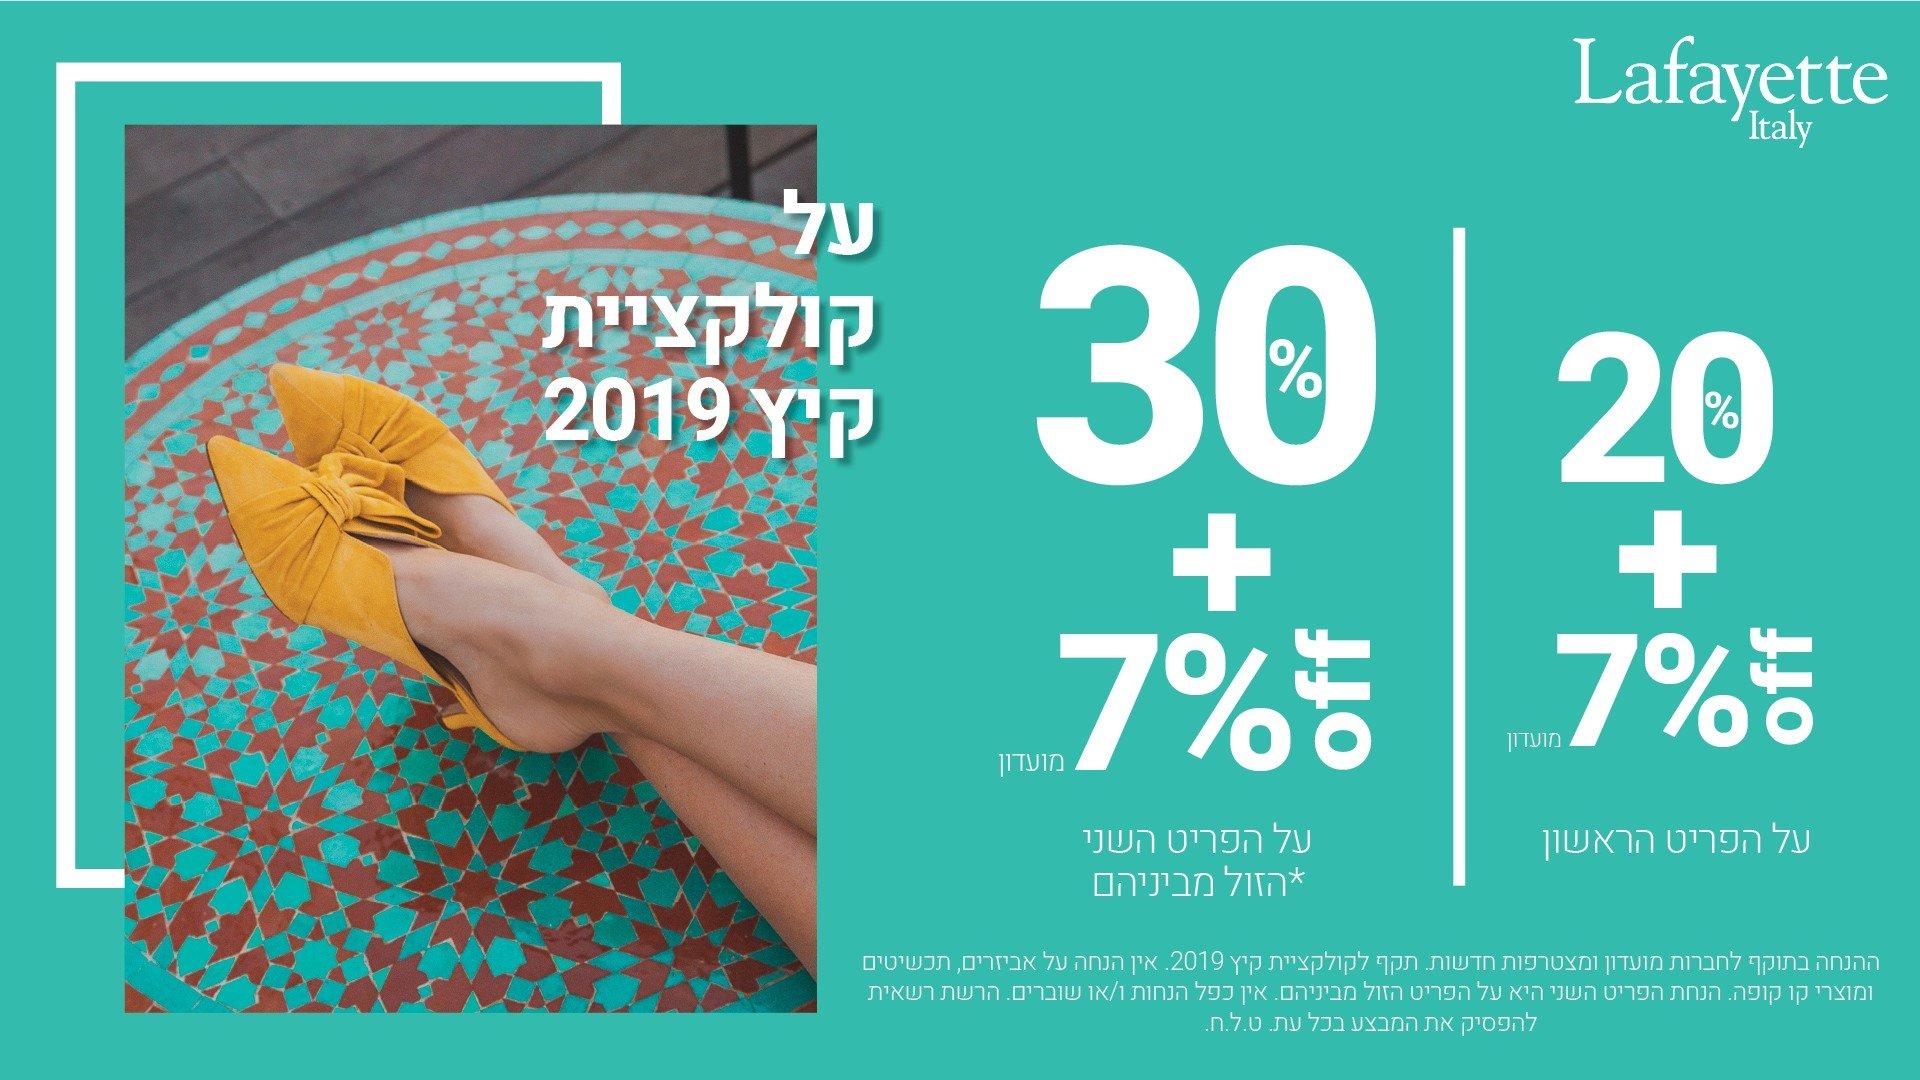 %d7%a8%d7%95%d7%97%d7%91%d7%99-%d7%9c%d7%90%d7%aa%d7%a8-1-2